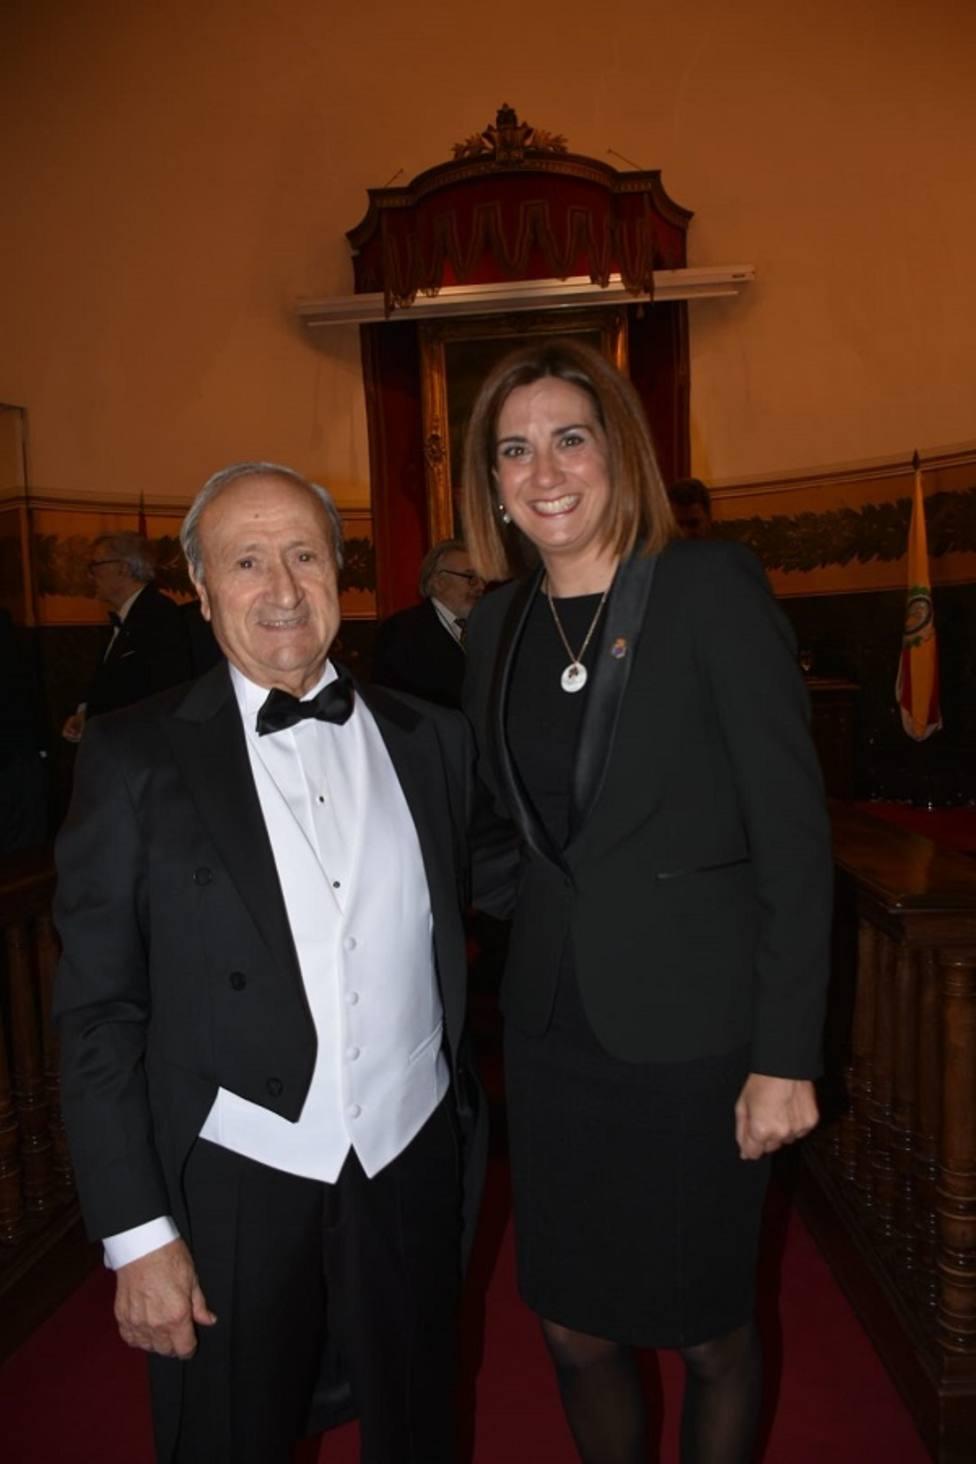 Patricia Fernández, alcaldesa de Archena, acompañó al Doctor Pedro Guillén